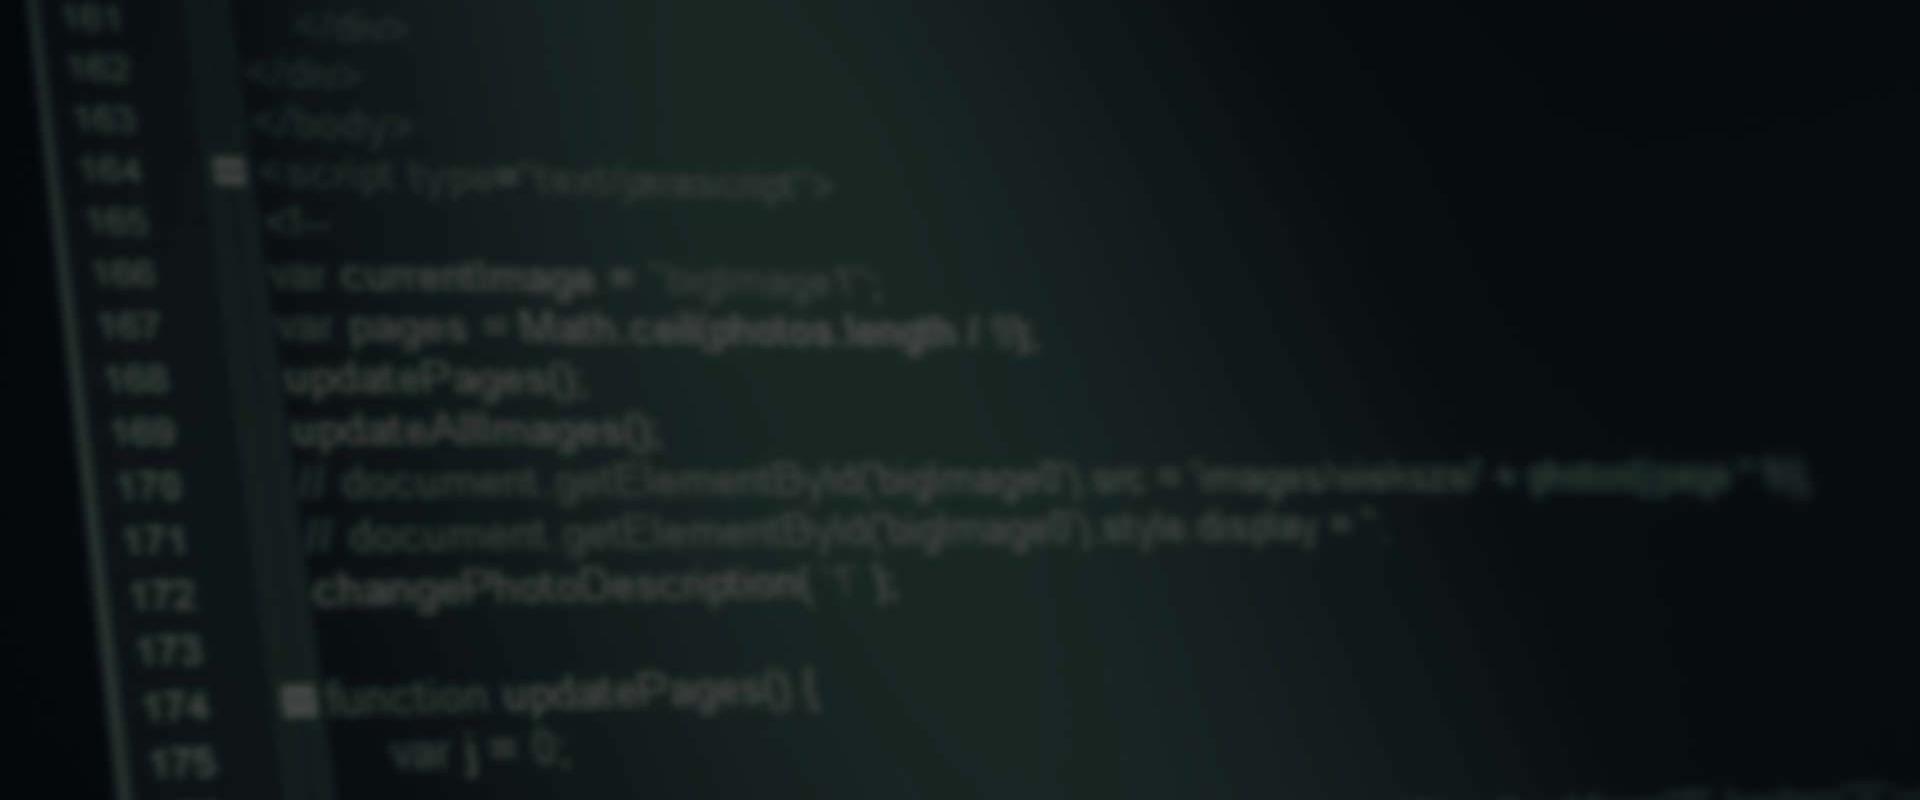 Thinkdolphin Web Design